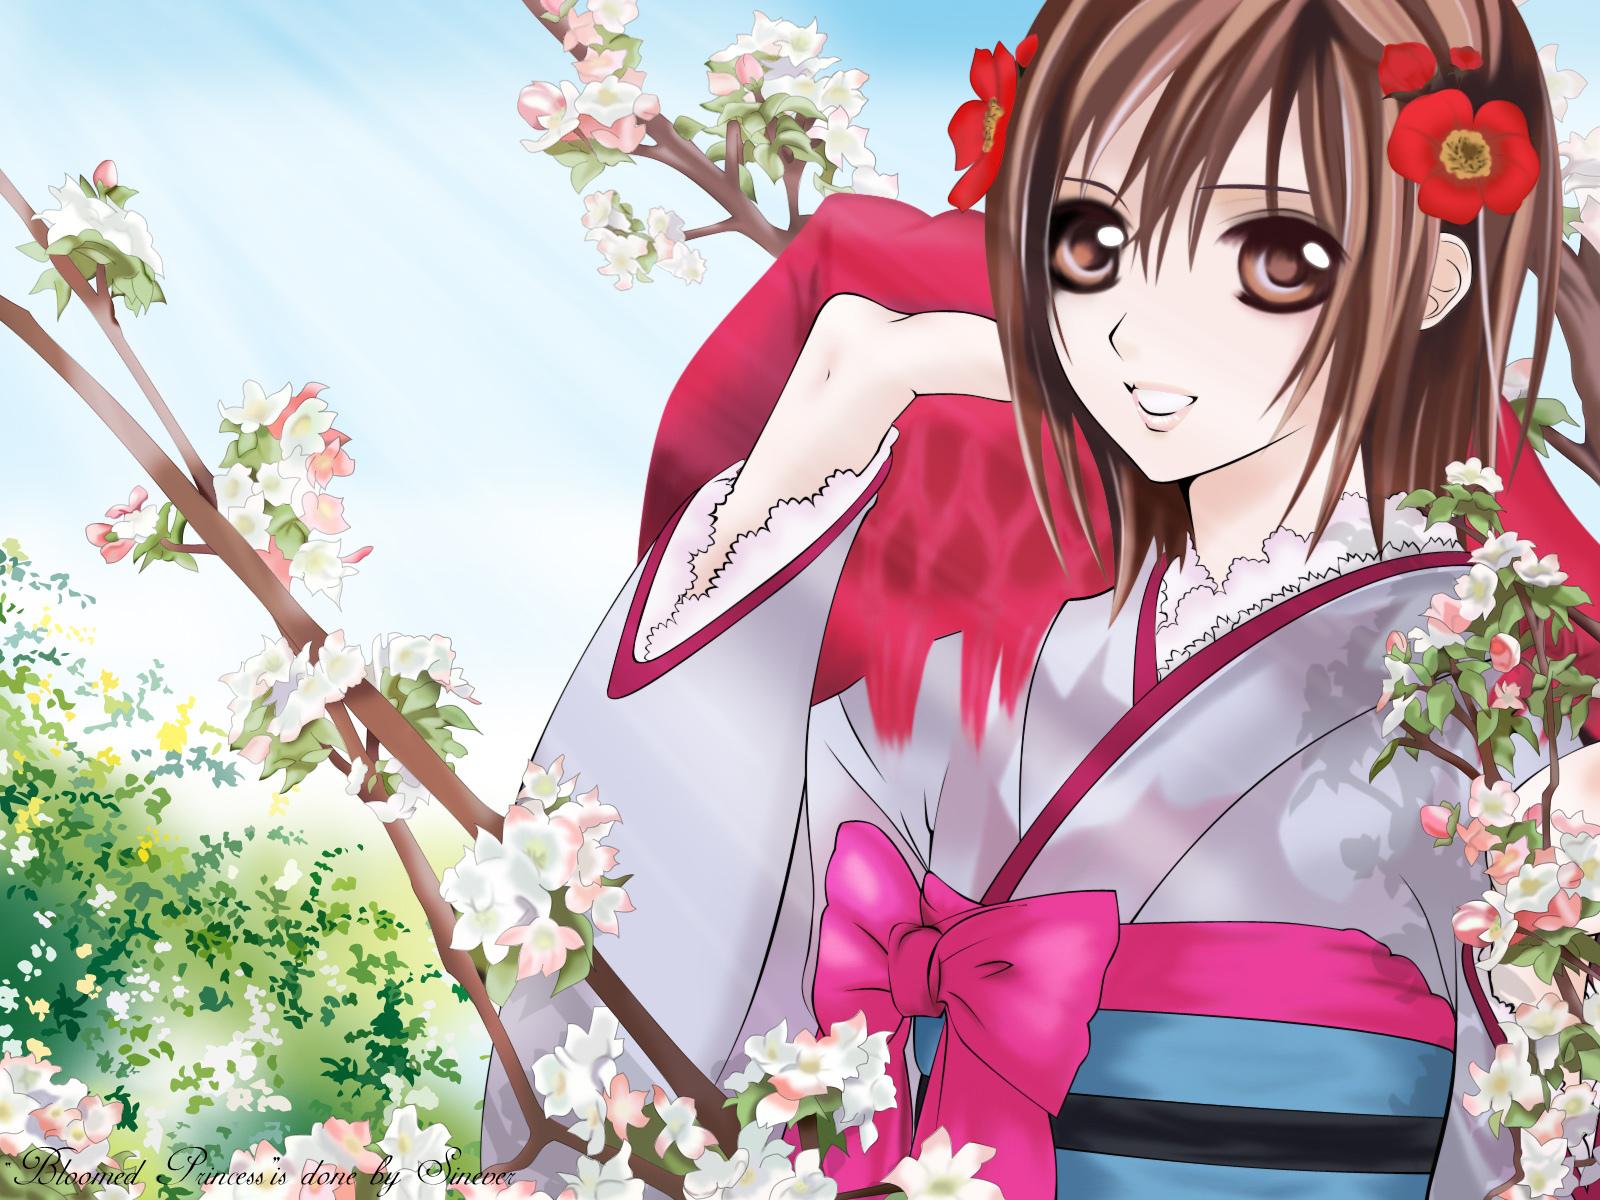 Kawaii Anime Images Yuki Cross Wallpaper Hd Wallpaper And Background Photos